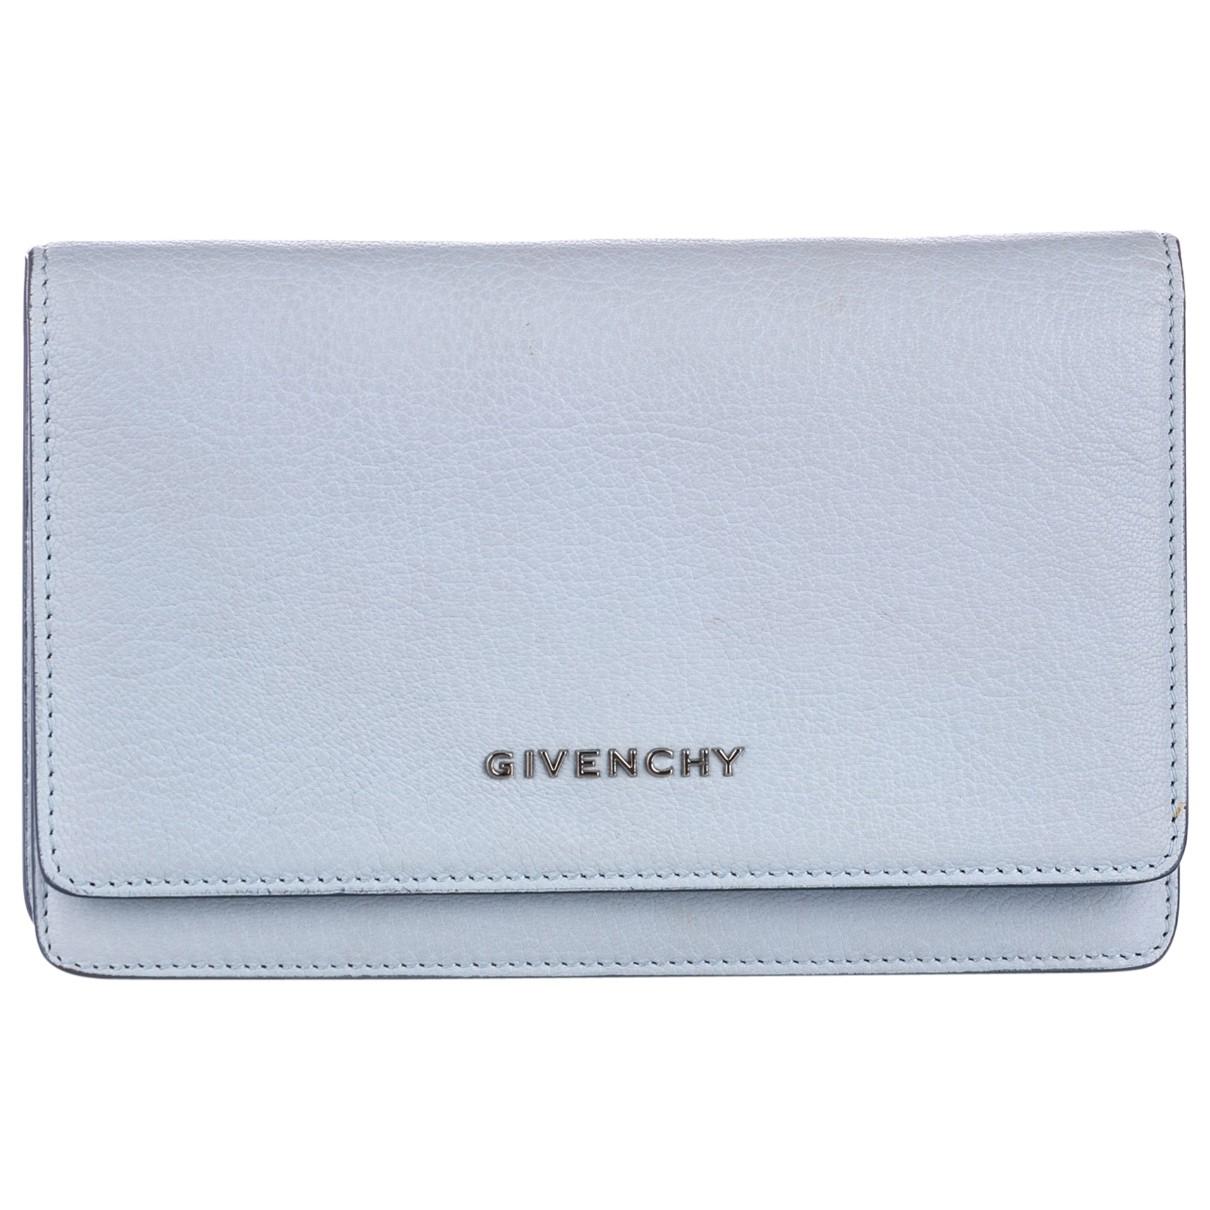 Givenchy \N Portemonnaie in  Blau Leder